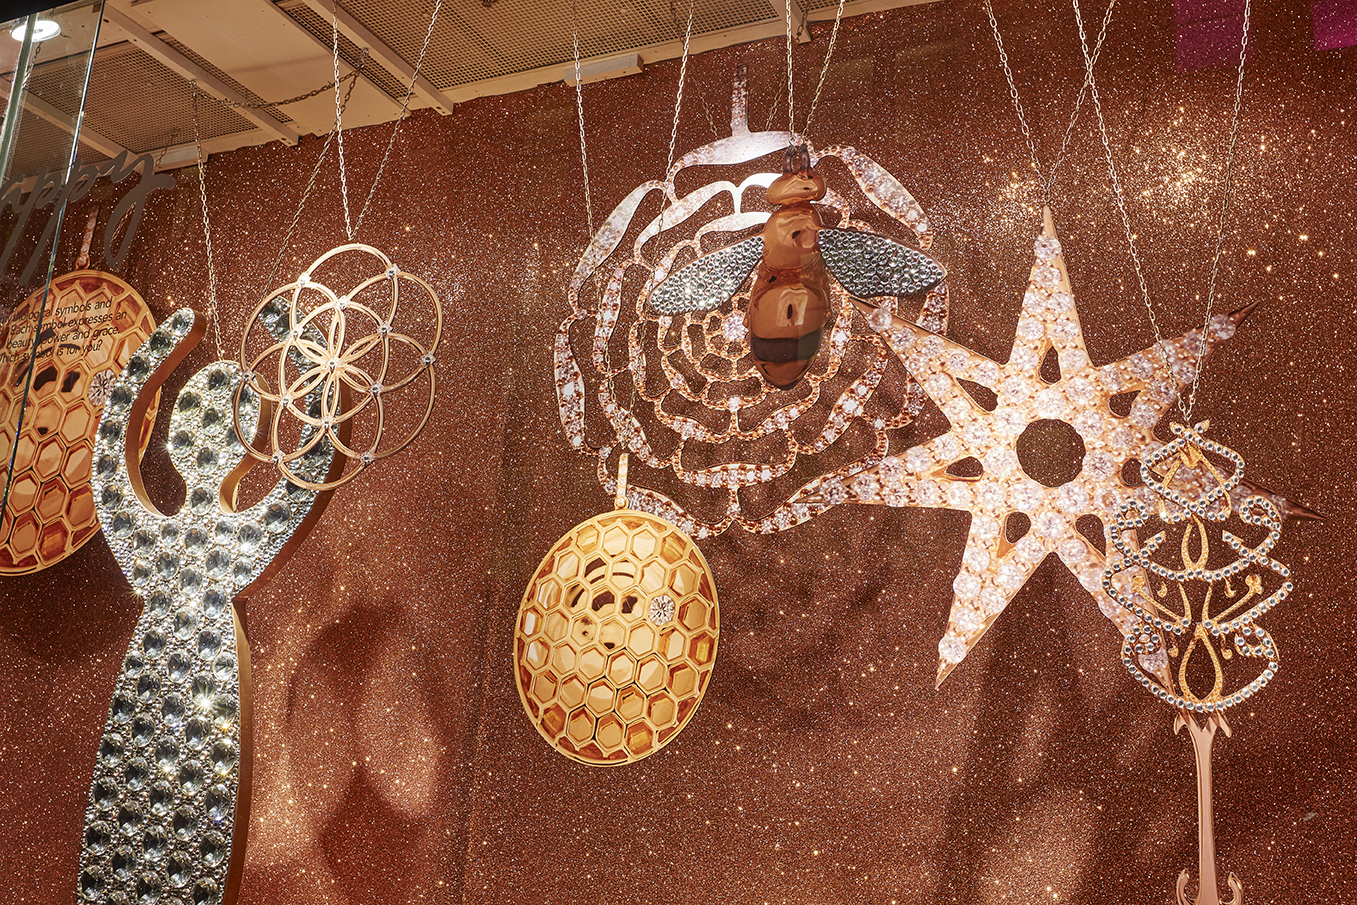 Fenwicks, Window Display, Bee Jewellery, Props, Fashion, Accessories, Bond Street Retail 3.jpg